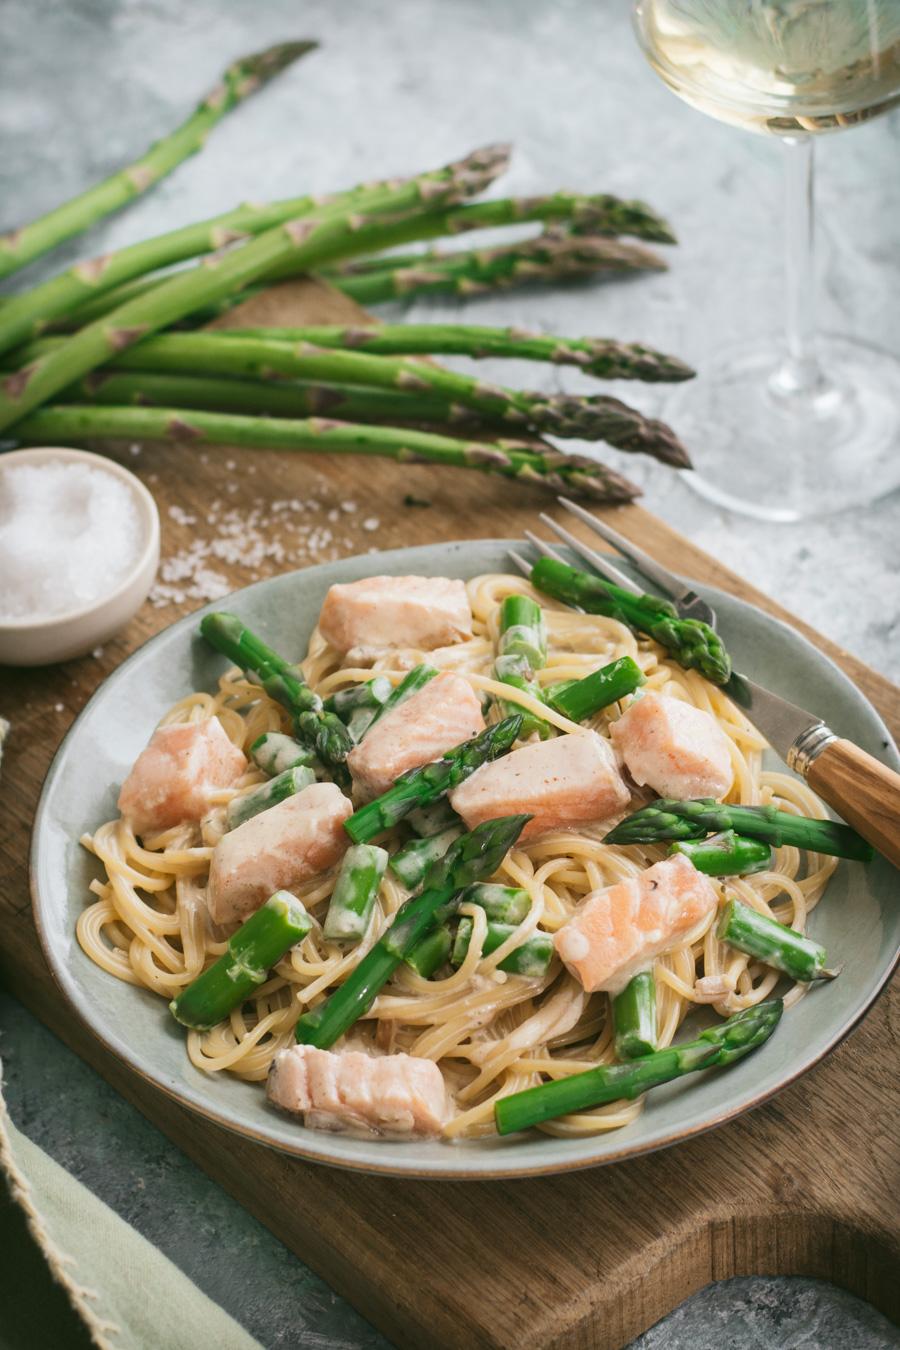 Chic, Chic, Chocolat: Spaghetti au saumon et aux asperges vertes